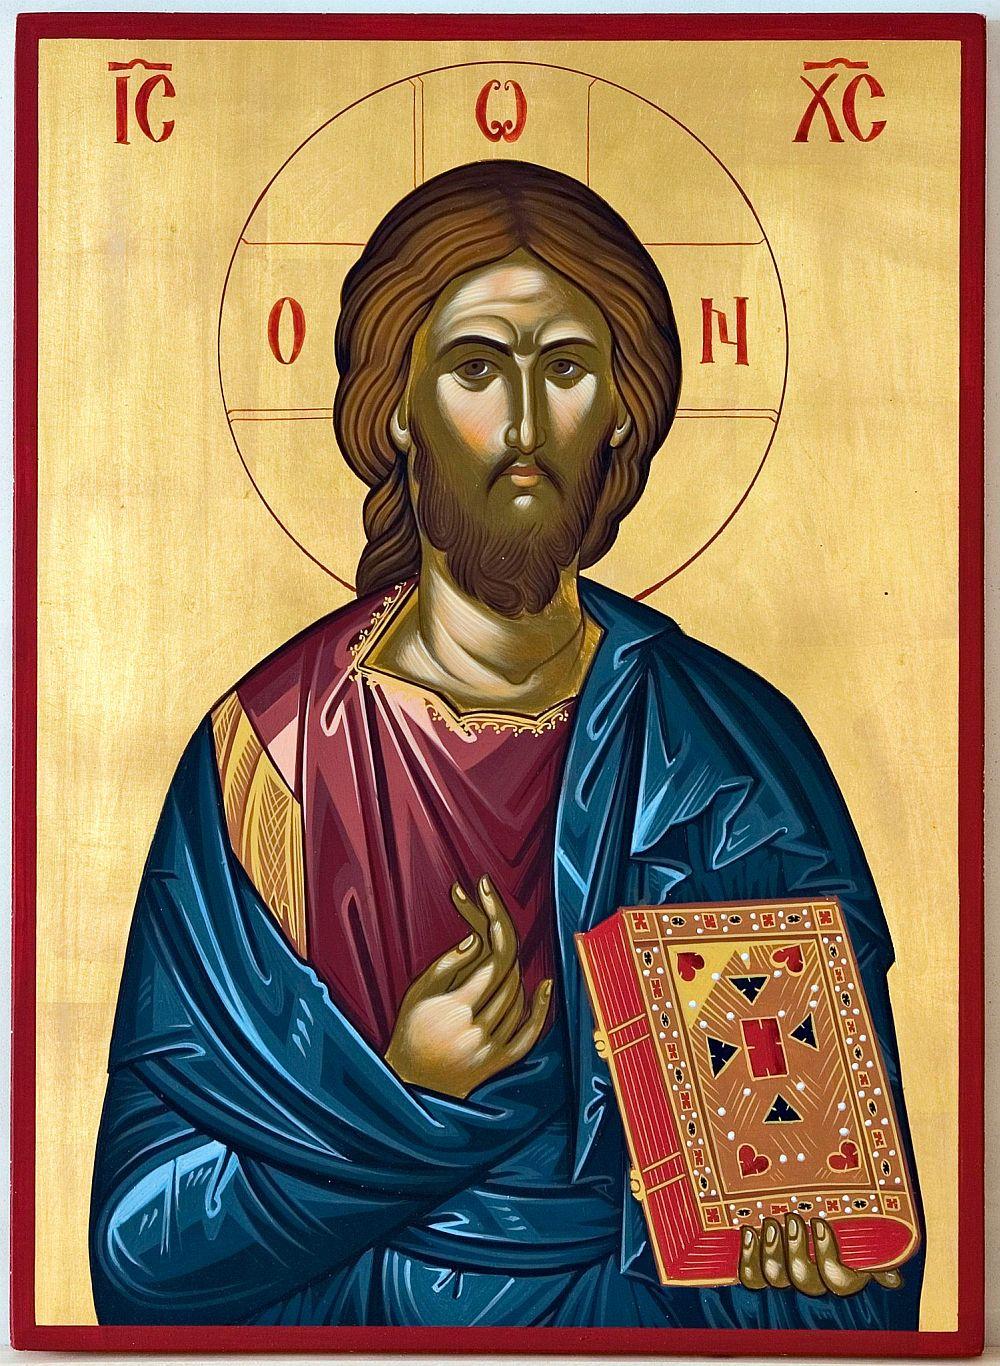 adelaparvu.com despre icoane bizantine pictate de Lorand Kolumban si Jakab Tibor (3)